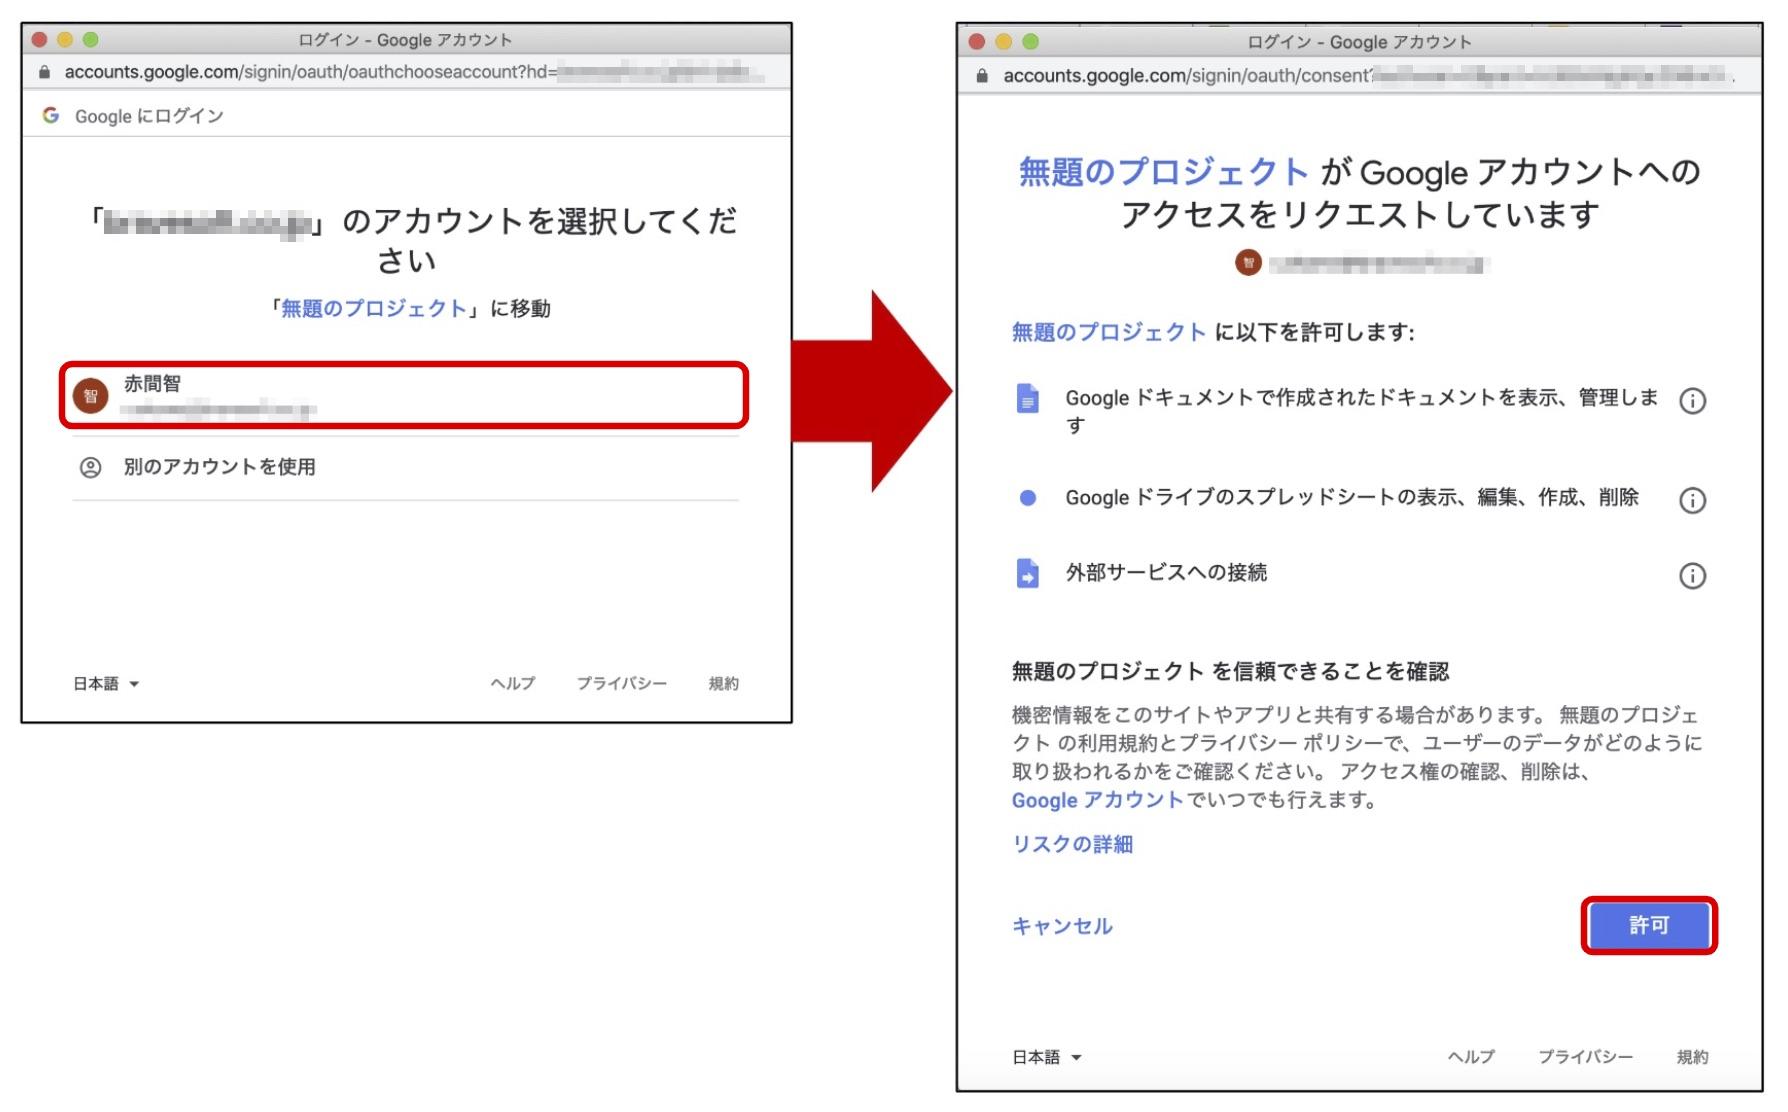 Google Apps ScriptにGoogleのデータへのアクセスを許可する設定